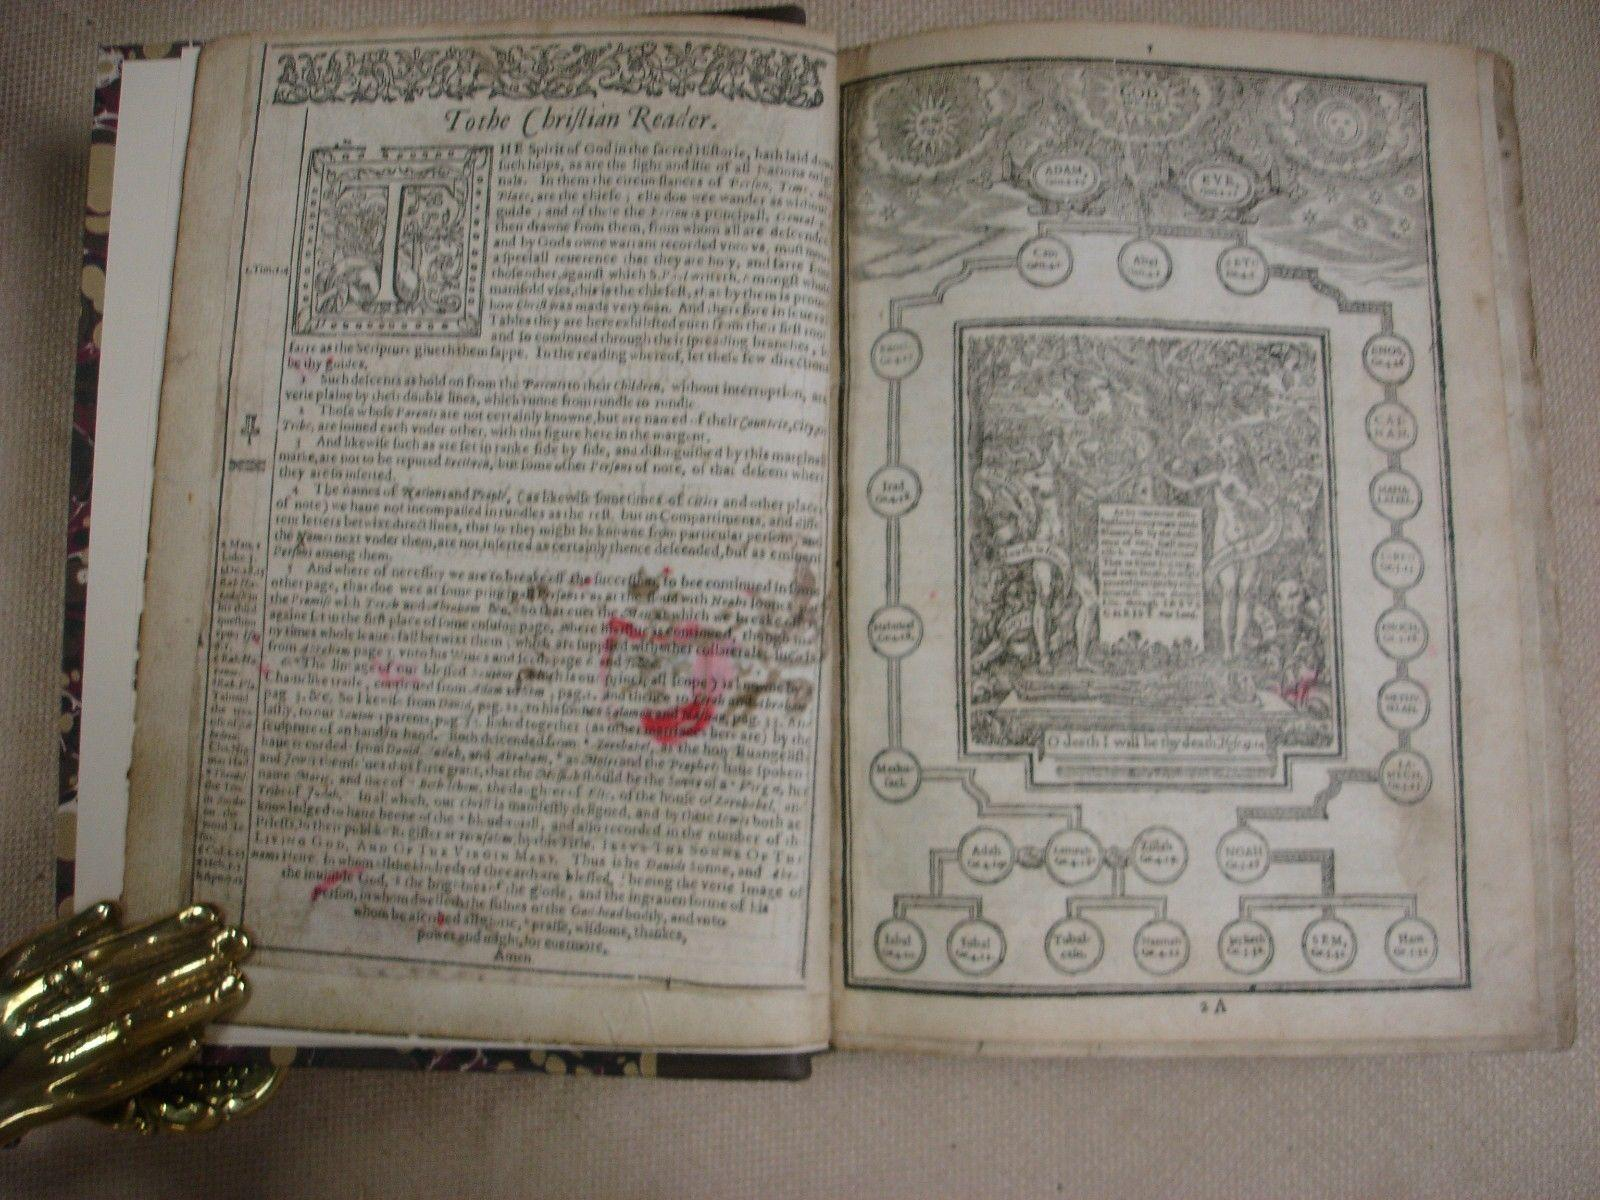 1600 Geneva Bible - Robert Barker